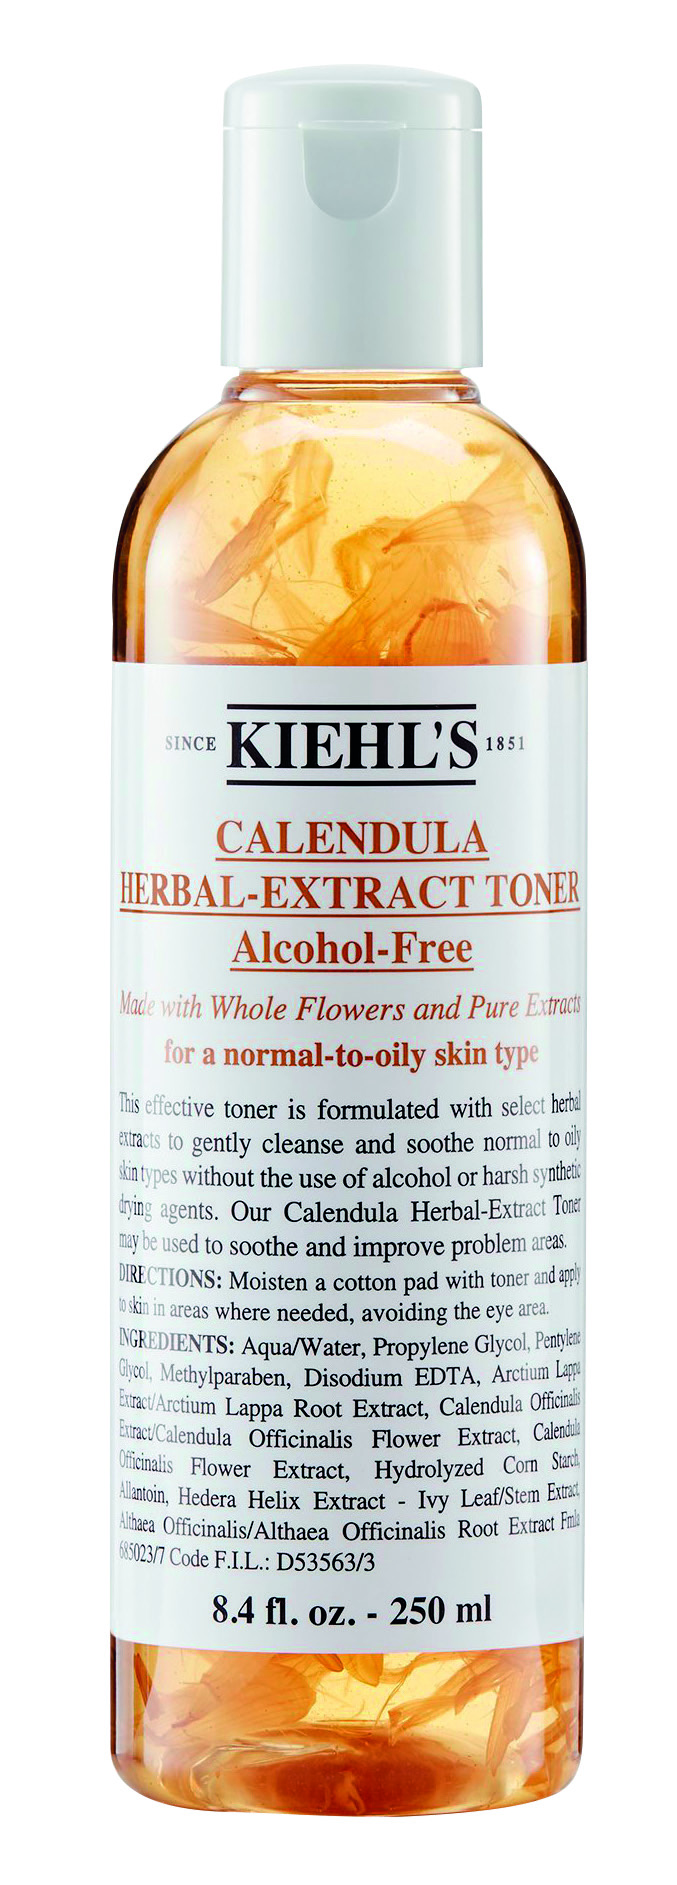 Calendula Herbal Extract Alcohol-Free Toner Kiehl's